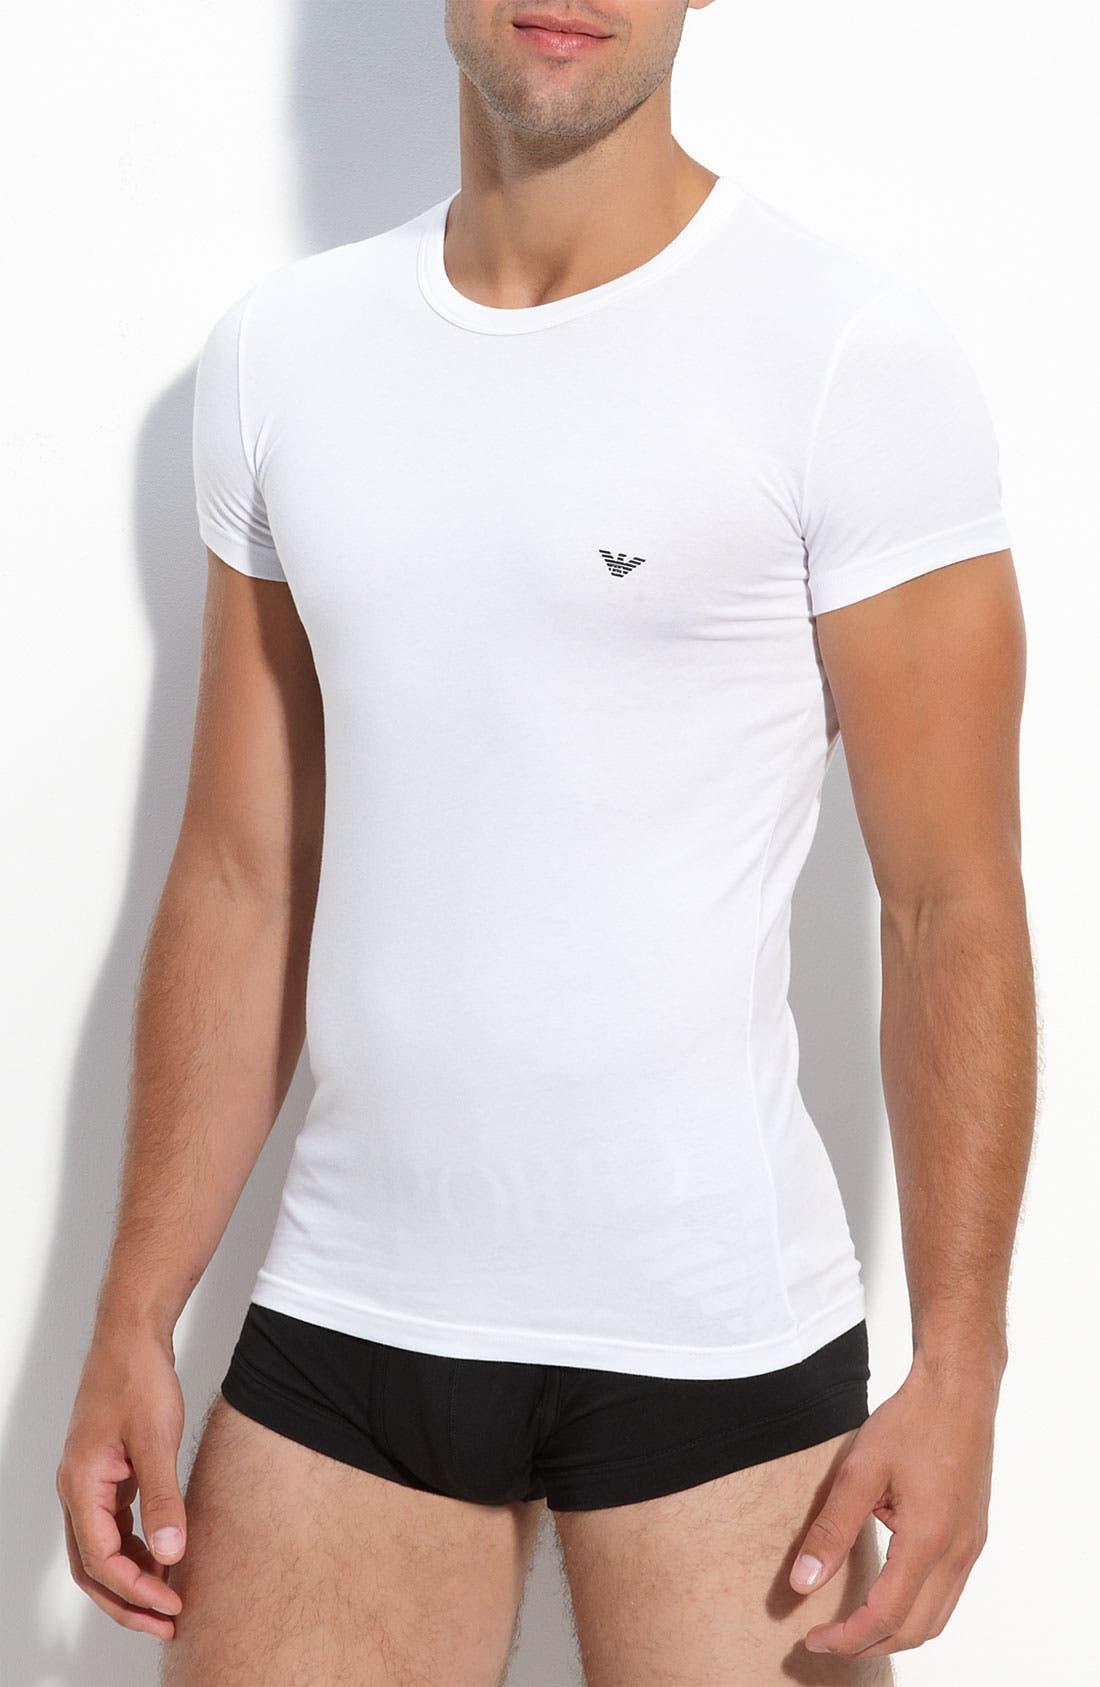 Main Image - Emporio Armani 'Eagle' Crewneck T-Shirt